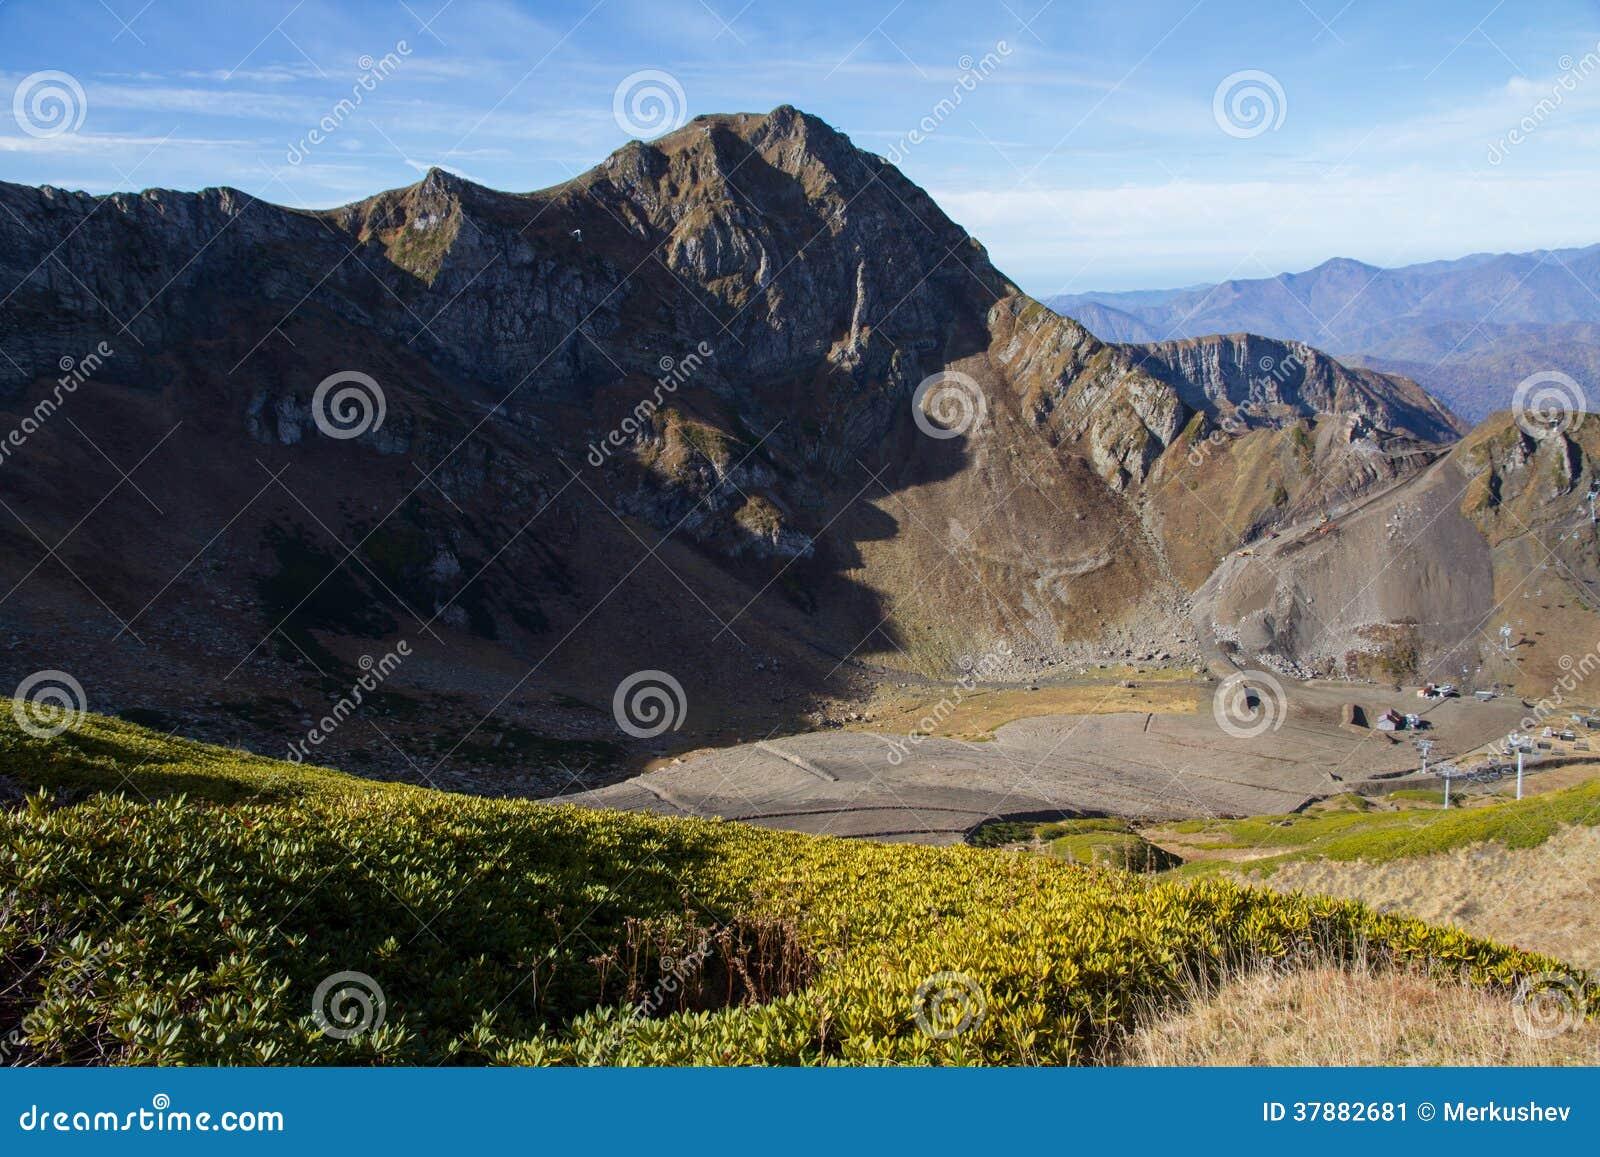 Bergen van Krasnaya Polyana (Sotchi, Rusland)